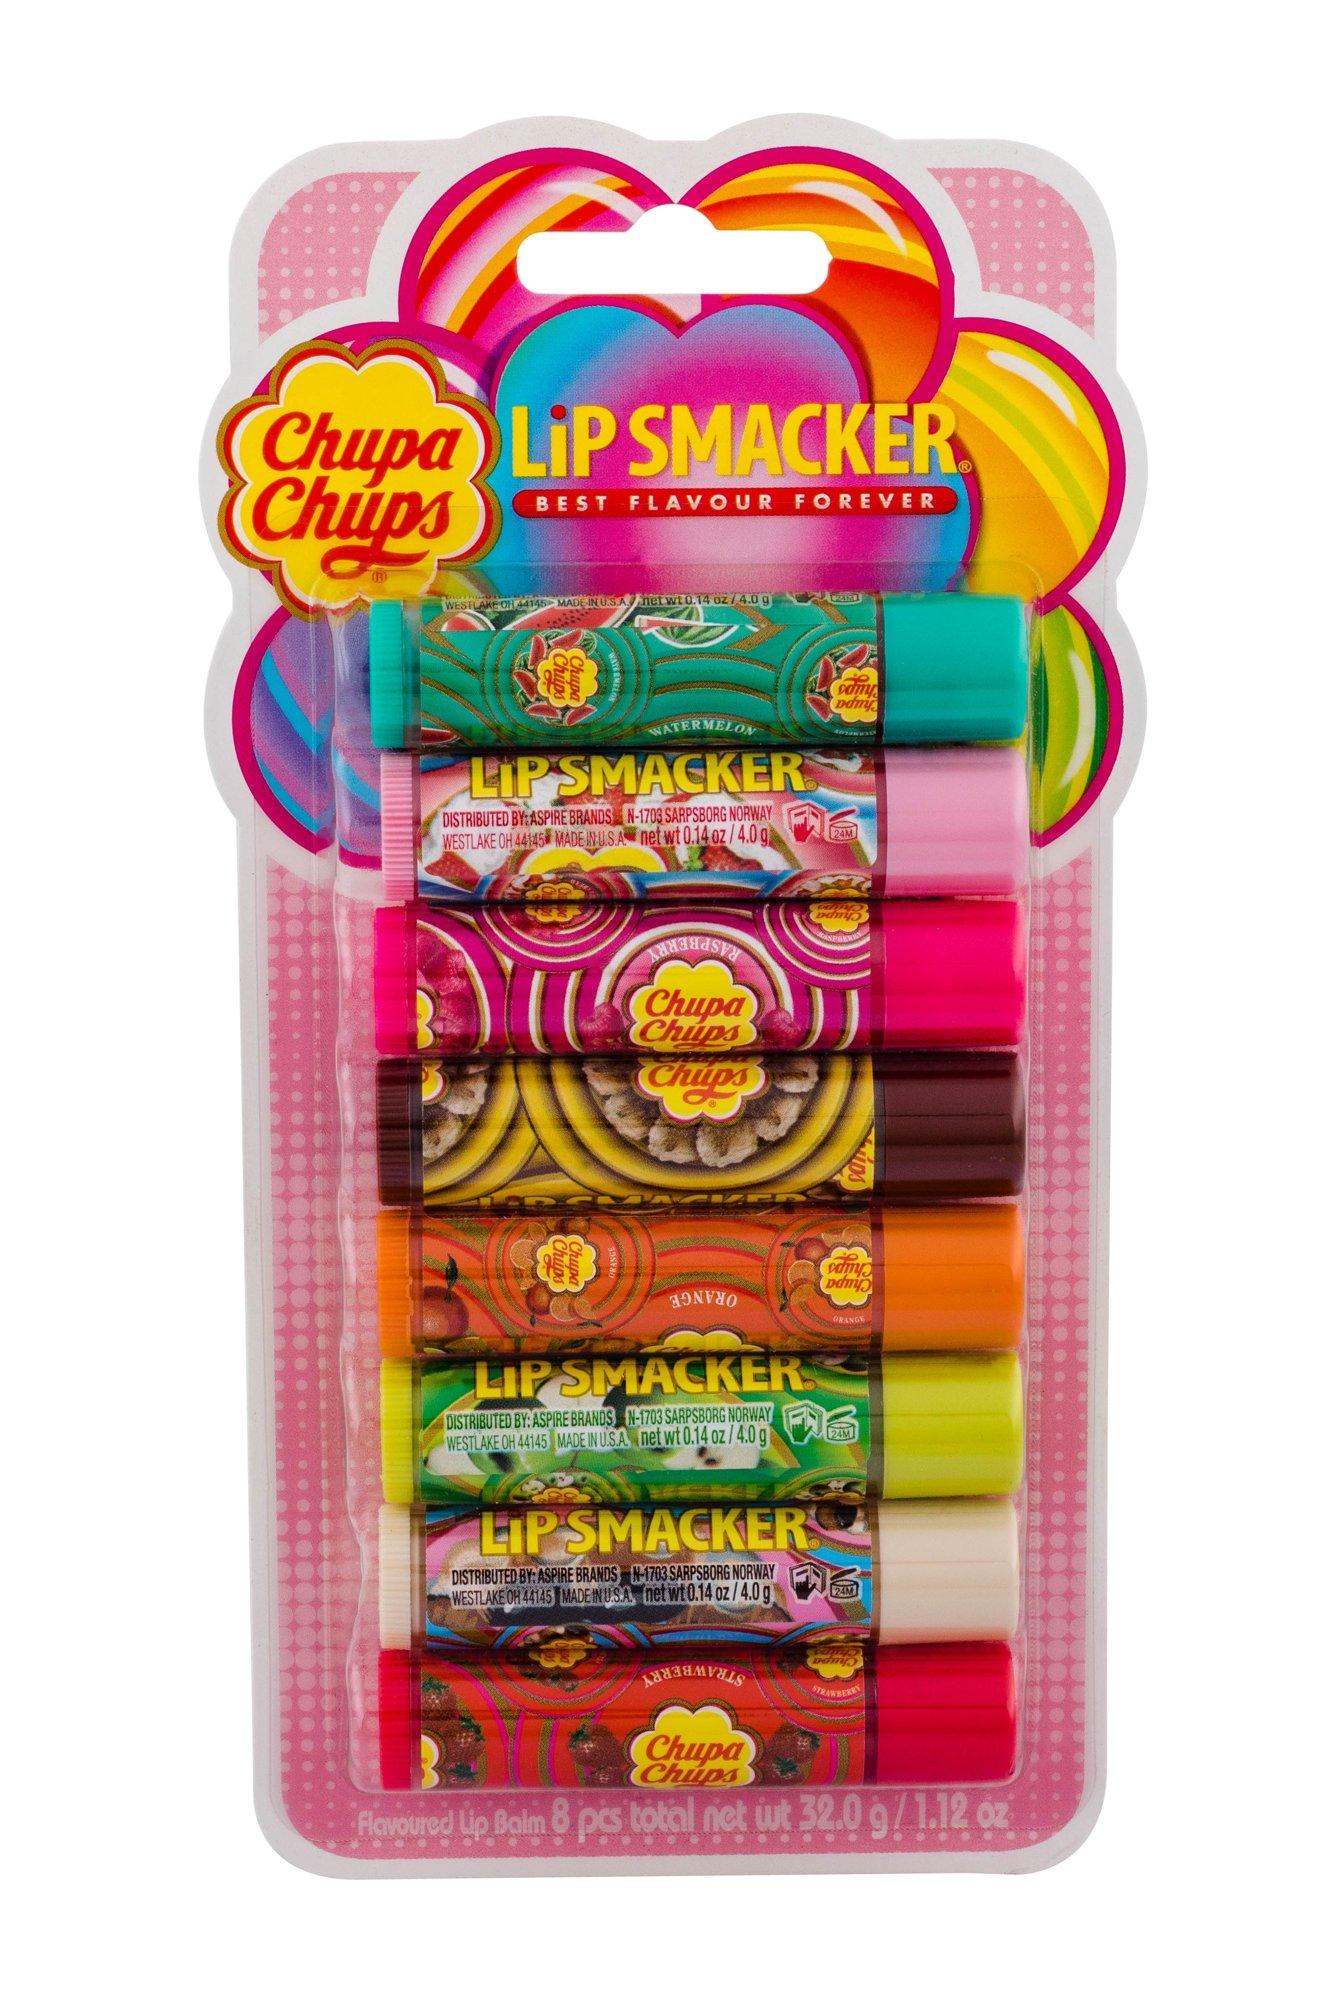 Lip Smacker Chupa Chups Lip Balm 4ml